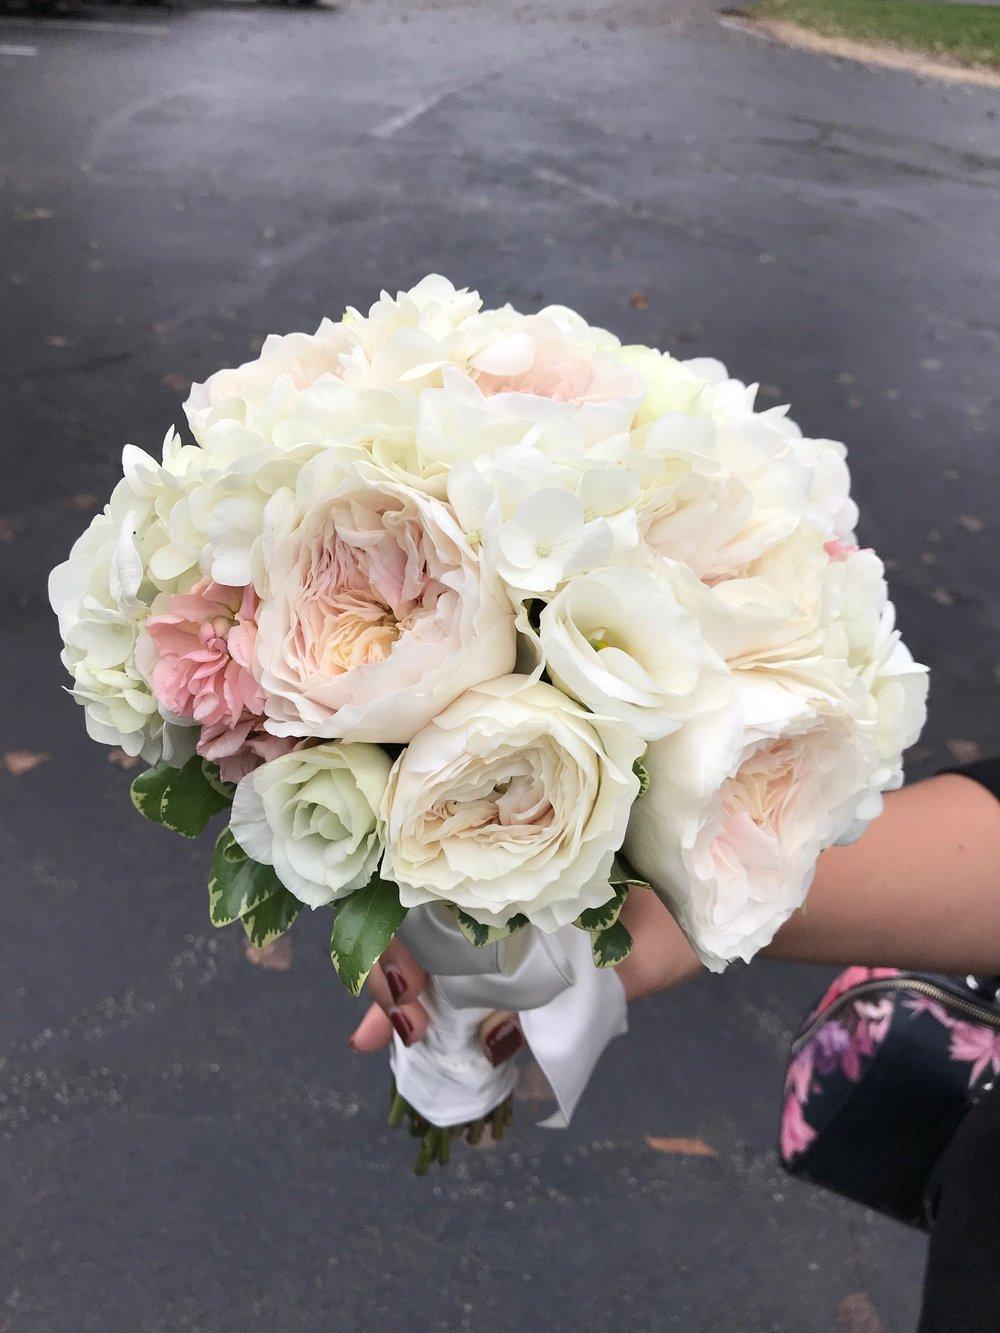 Cornbluth bouquet.JPG